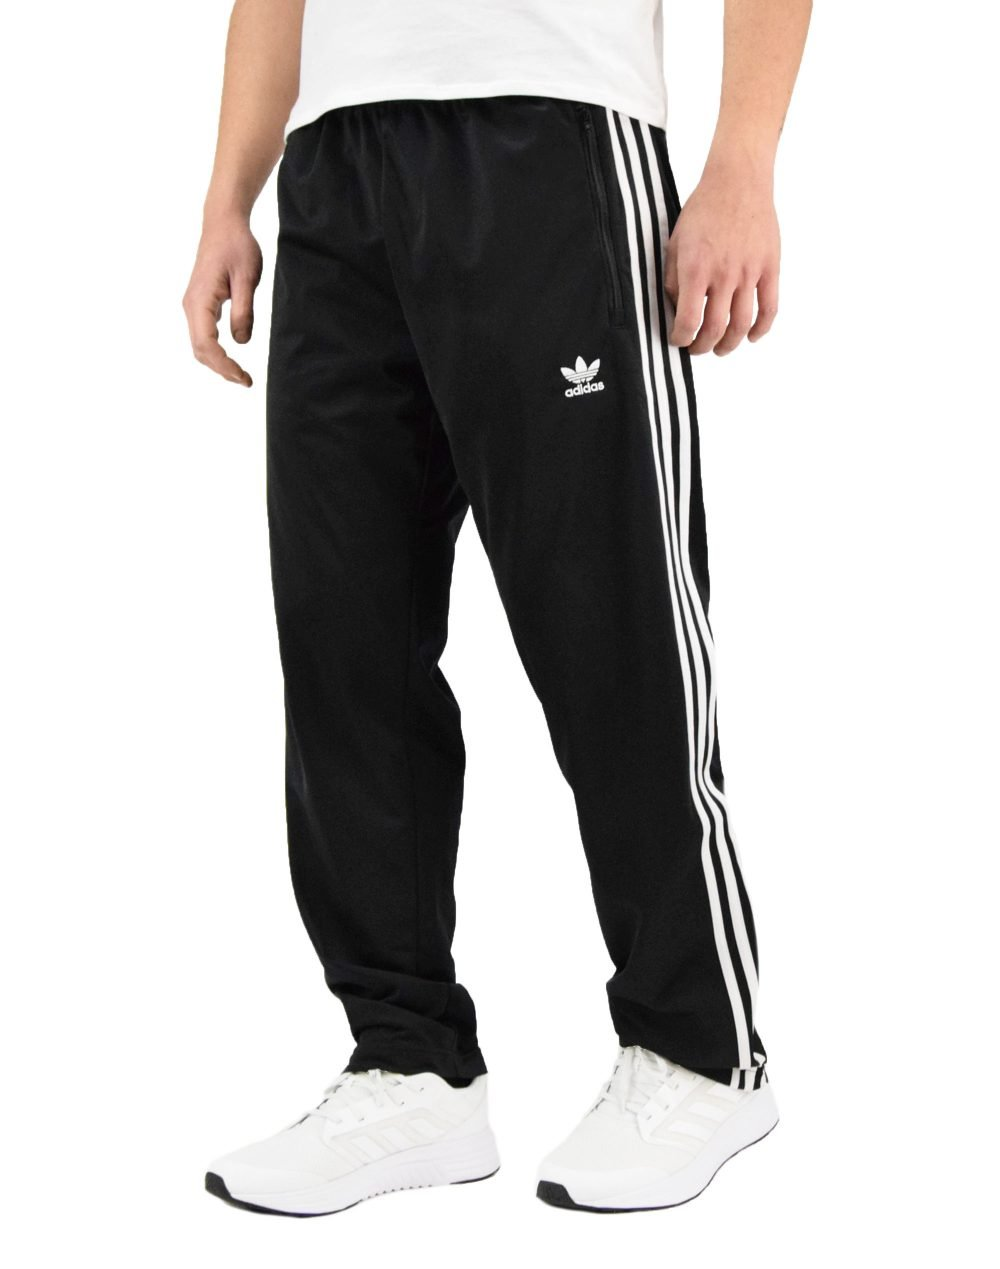 Adidas Firebird Primablue Pant (GN3517) Black